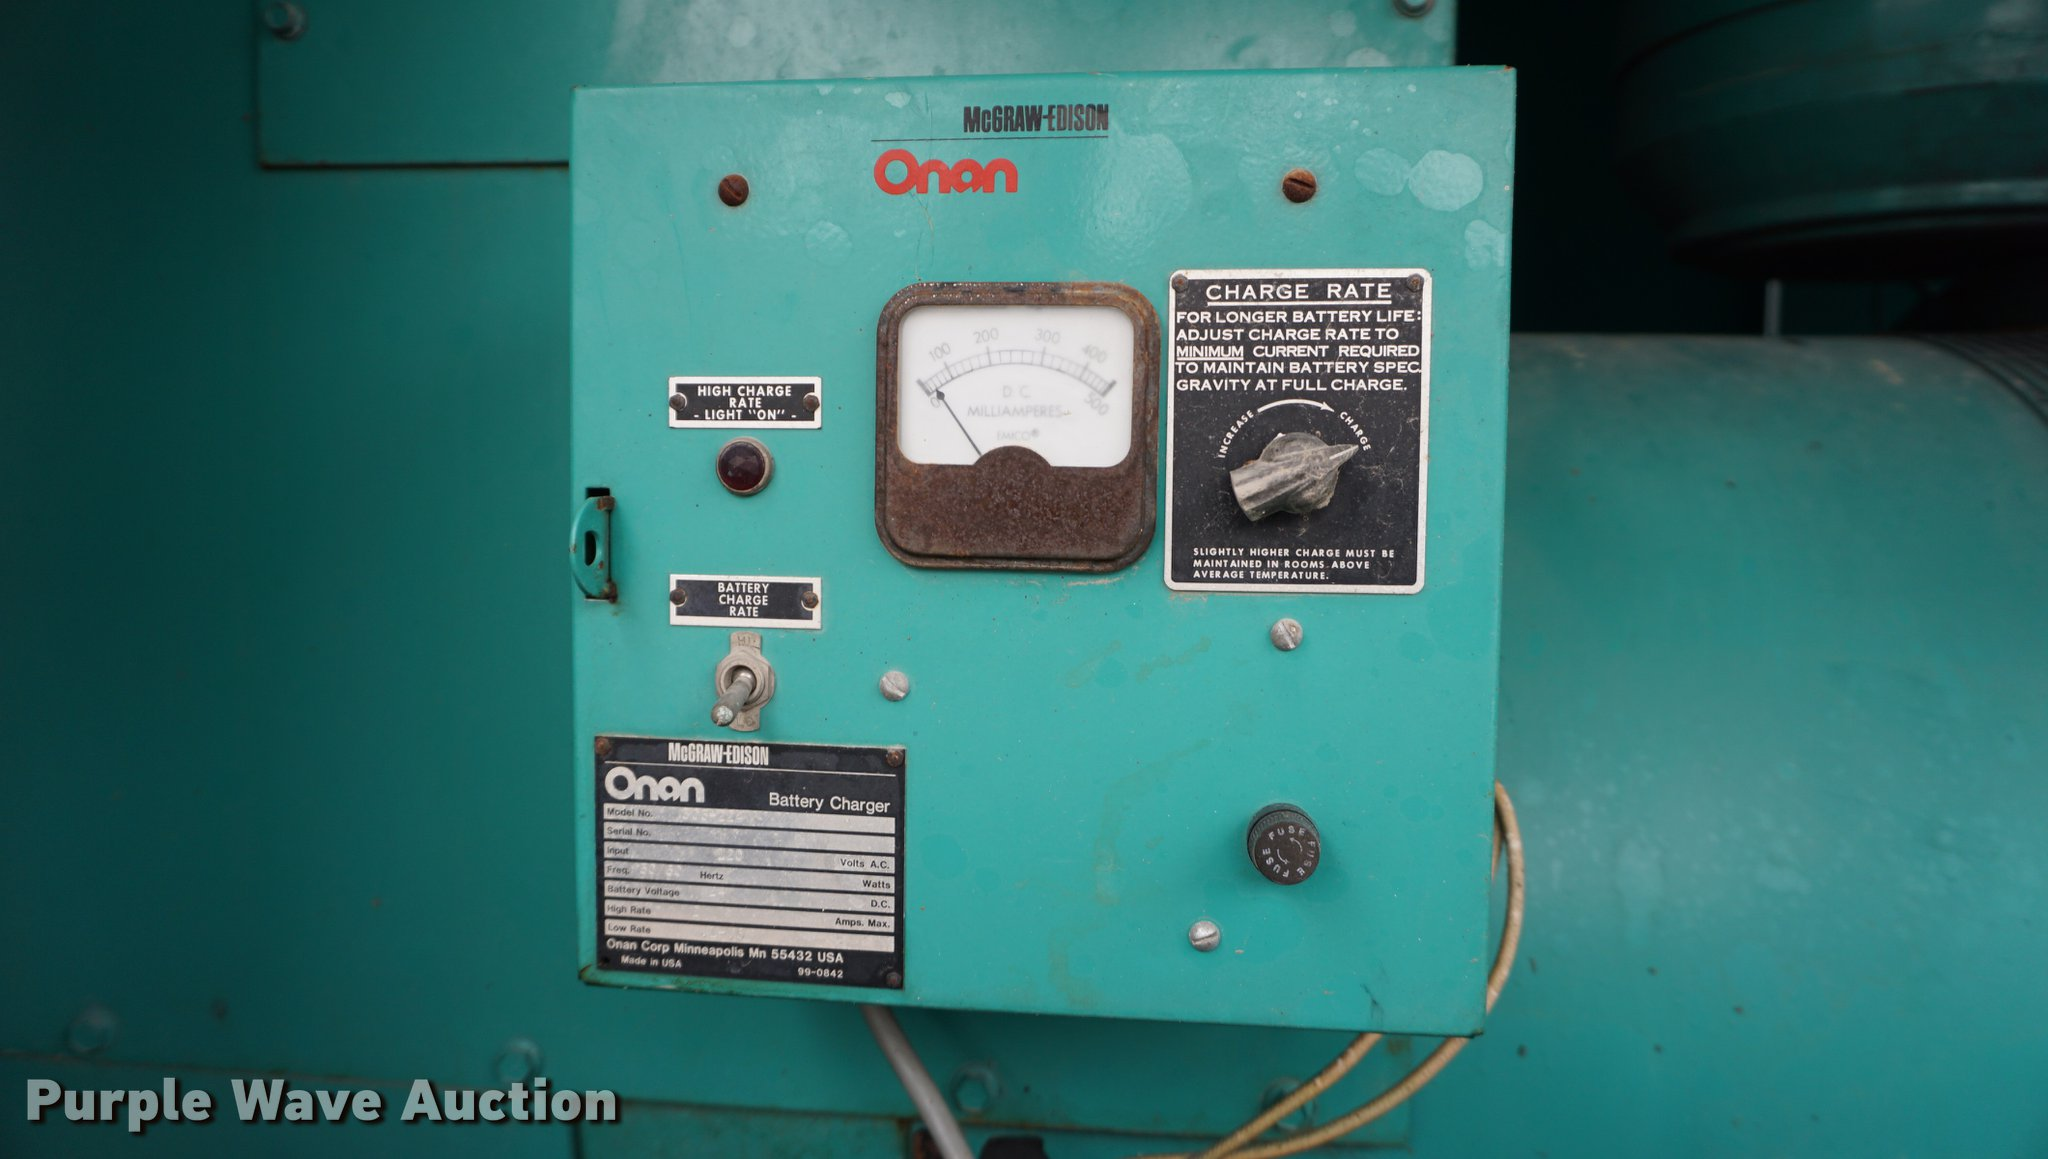 Onan 300 generator | Item DB0433 | SOLD! March 8 Constructio